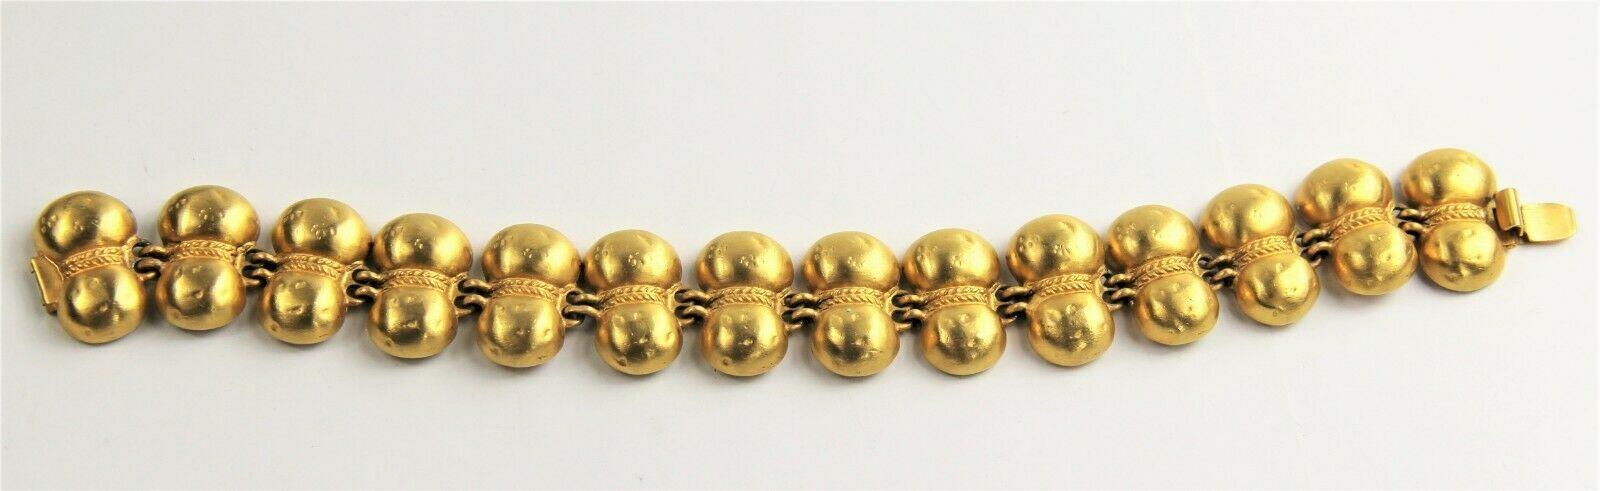 "7.5"" VINTAGE ESTATE Jewelry MATTE GOLD PLATE TRIBAL BOHO CHIC BRACELET"